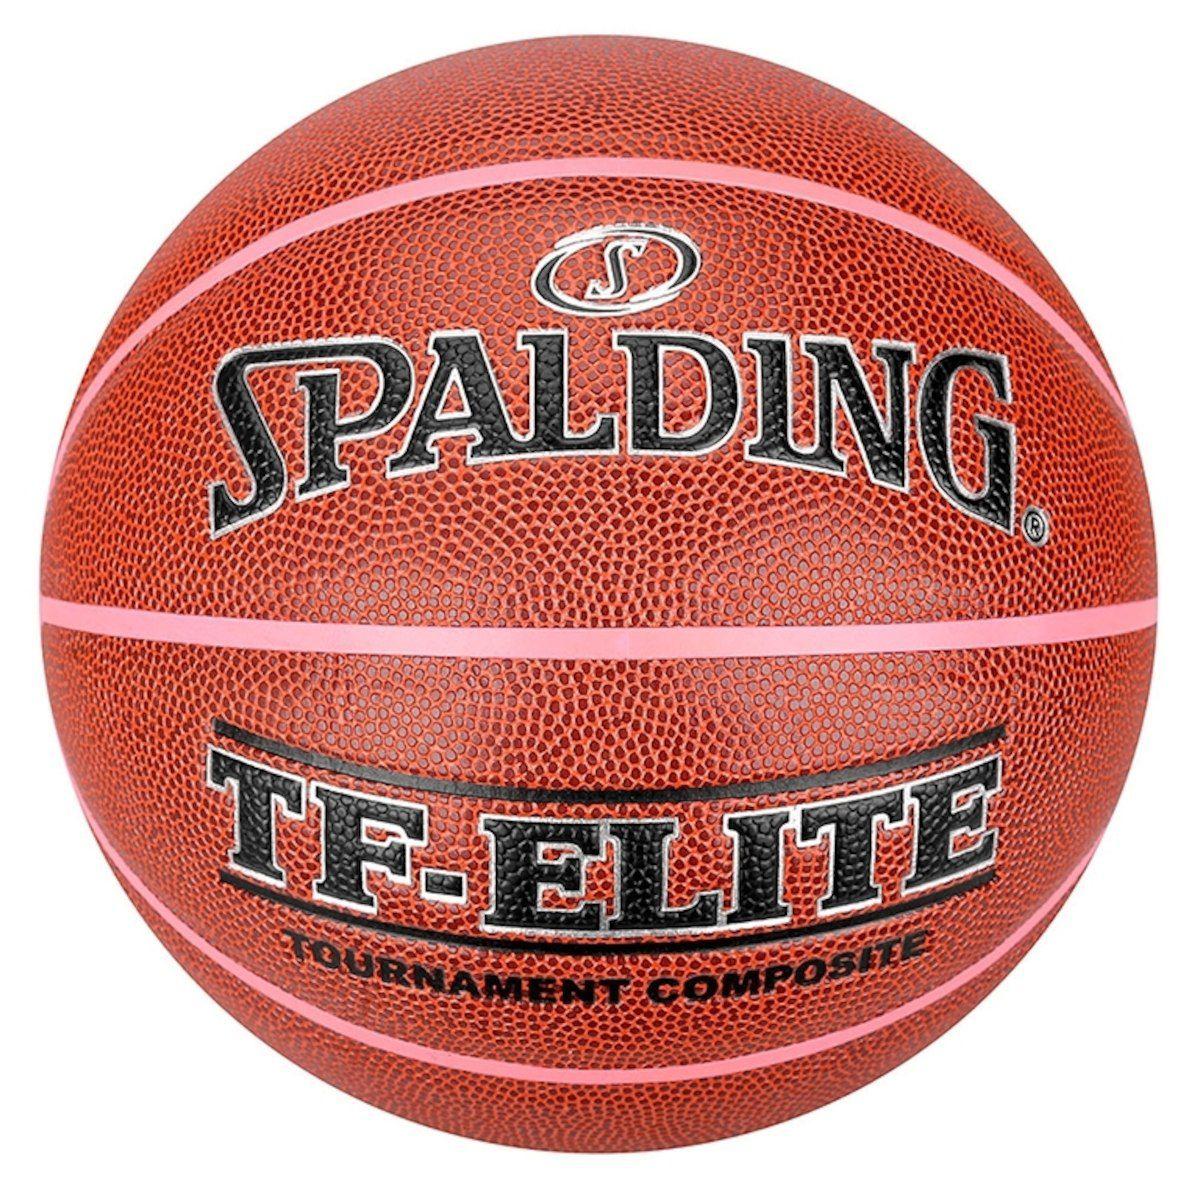 Bola Basquete Tf Elite Performance Pink Channels Spalding T - 6 - Titanes  Esportes ecb4acc36b181